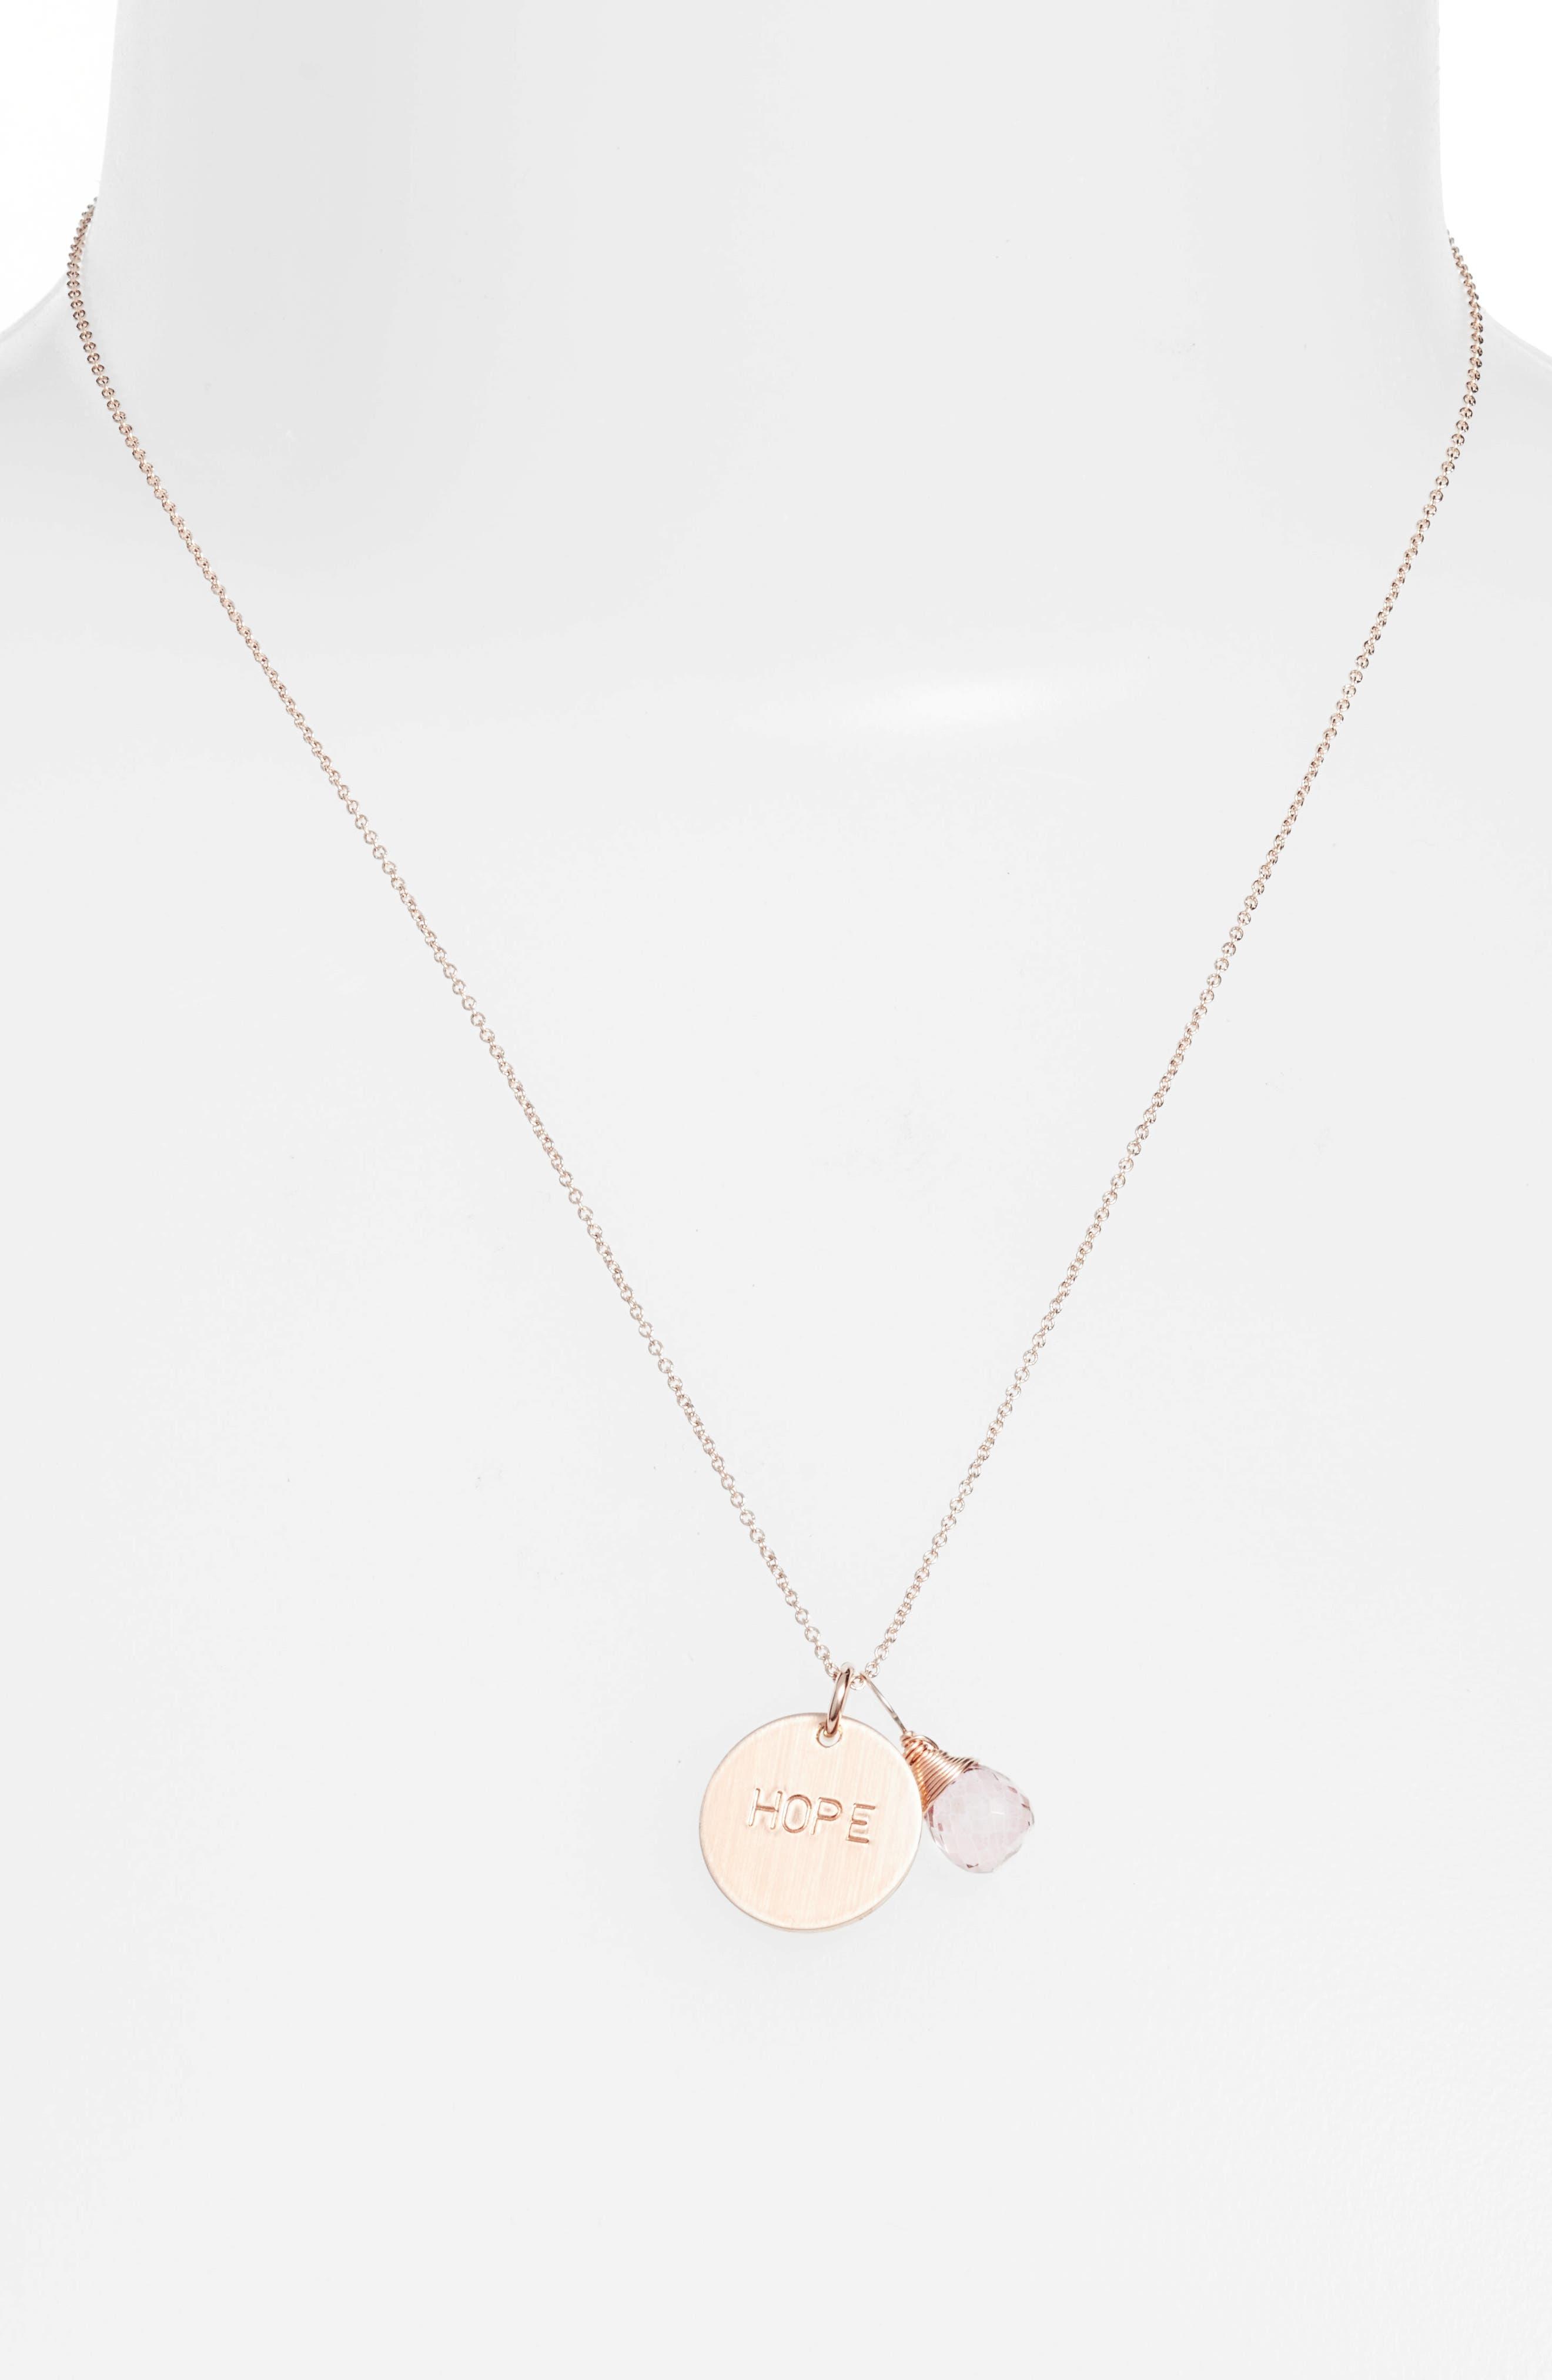 Alternate Image 1 Selected - Nashelle Pink Topaz & Hope Disc Necklace